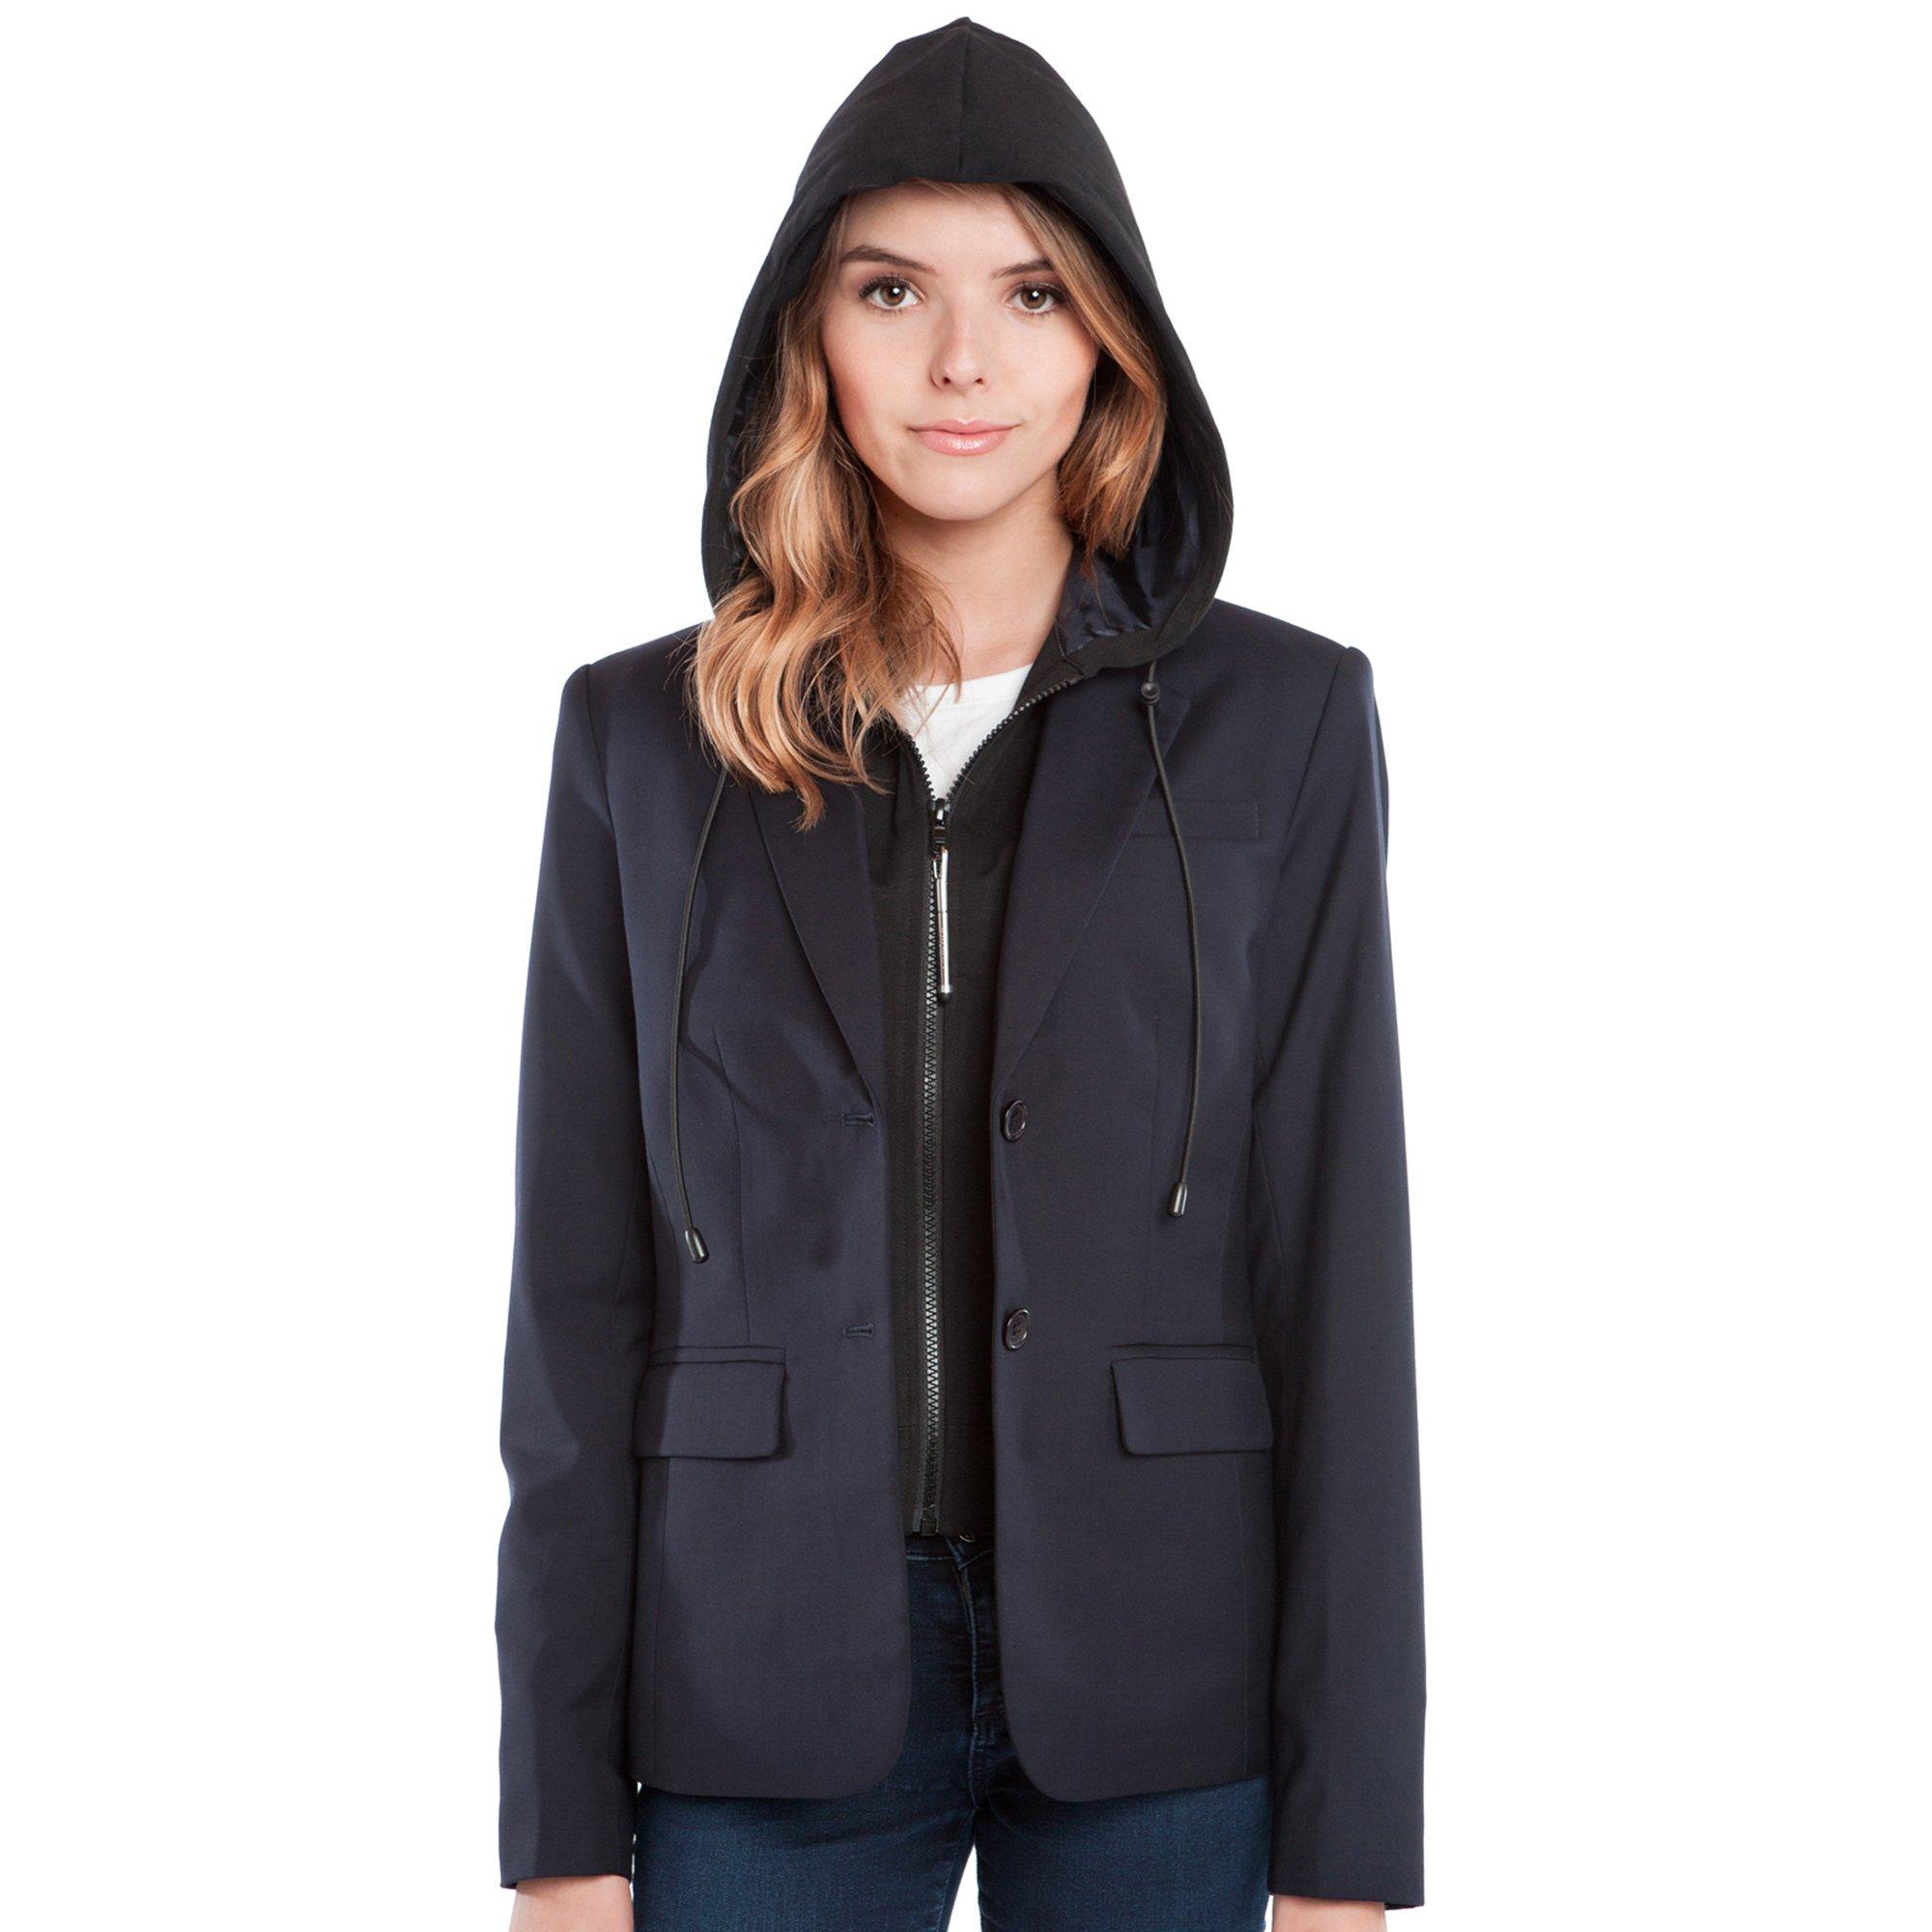 Baubax Travel Jacket - Blazer - Female - NAVY - Medium